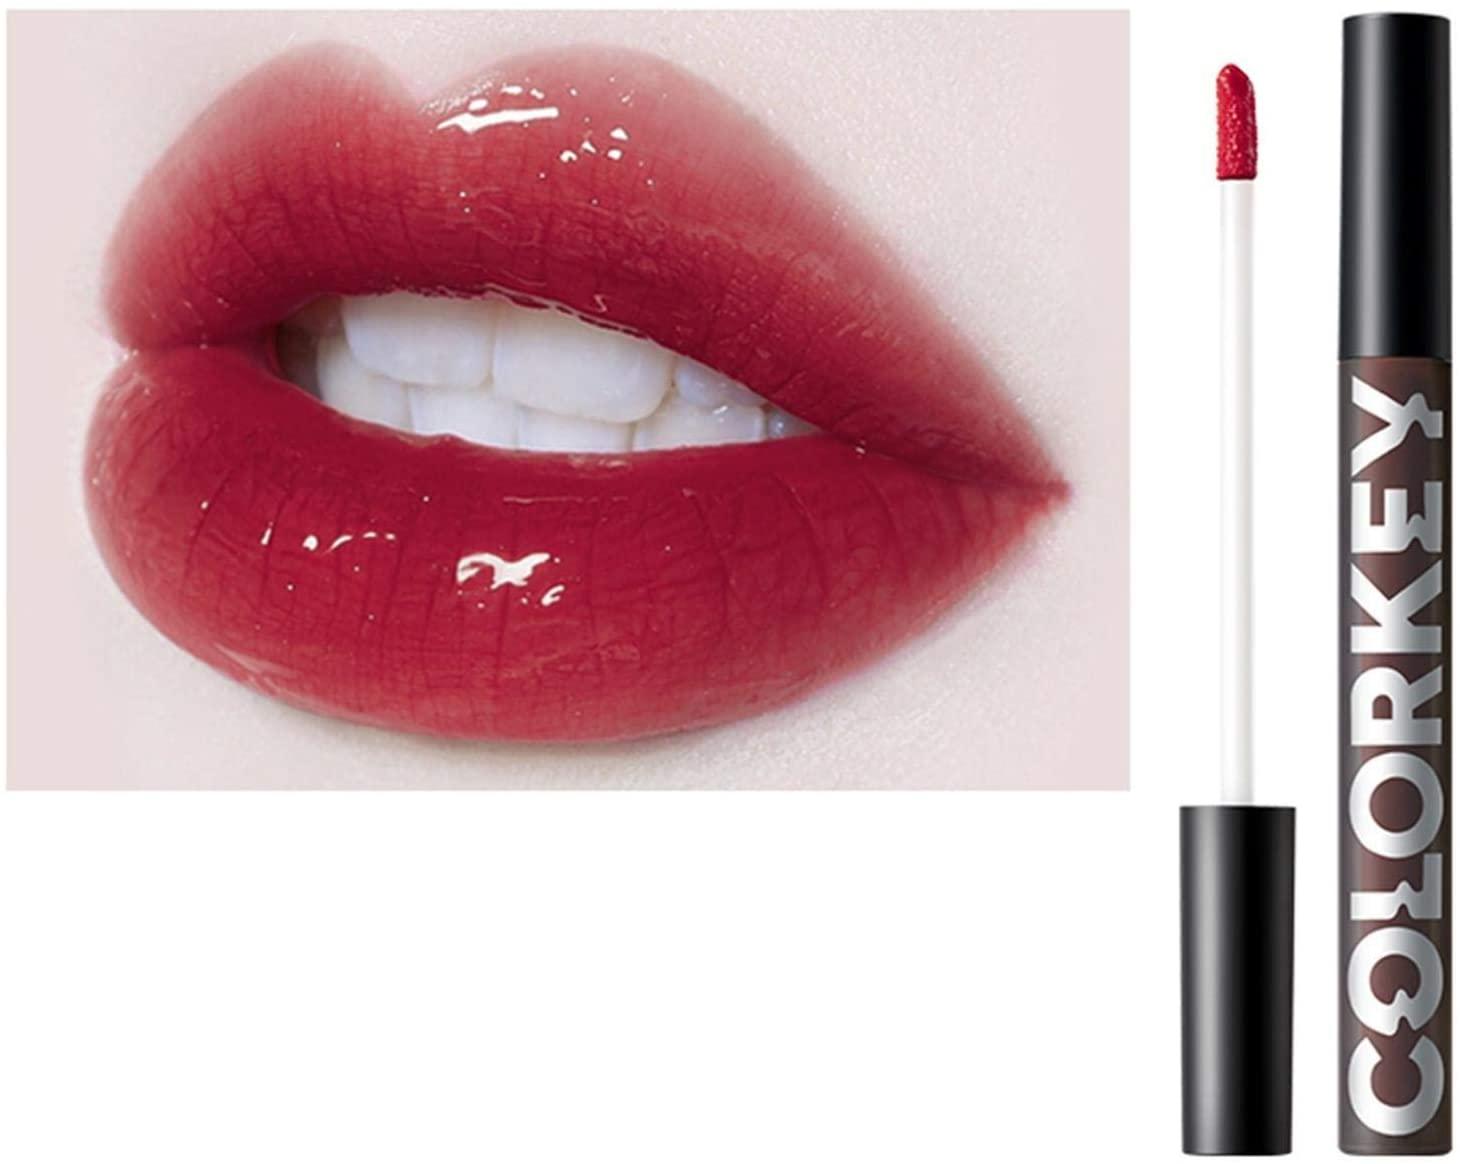 FASESH ColorKey Liquid Lipstick - 2020 Matte Velvety & Lacquer Gloss Lip Glaze - Long Lasting Waterproof, All-Day Moisturizer, Vegan Nutritious Lip Balm, Christmas Birthday Makeup Lip Color Gift